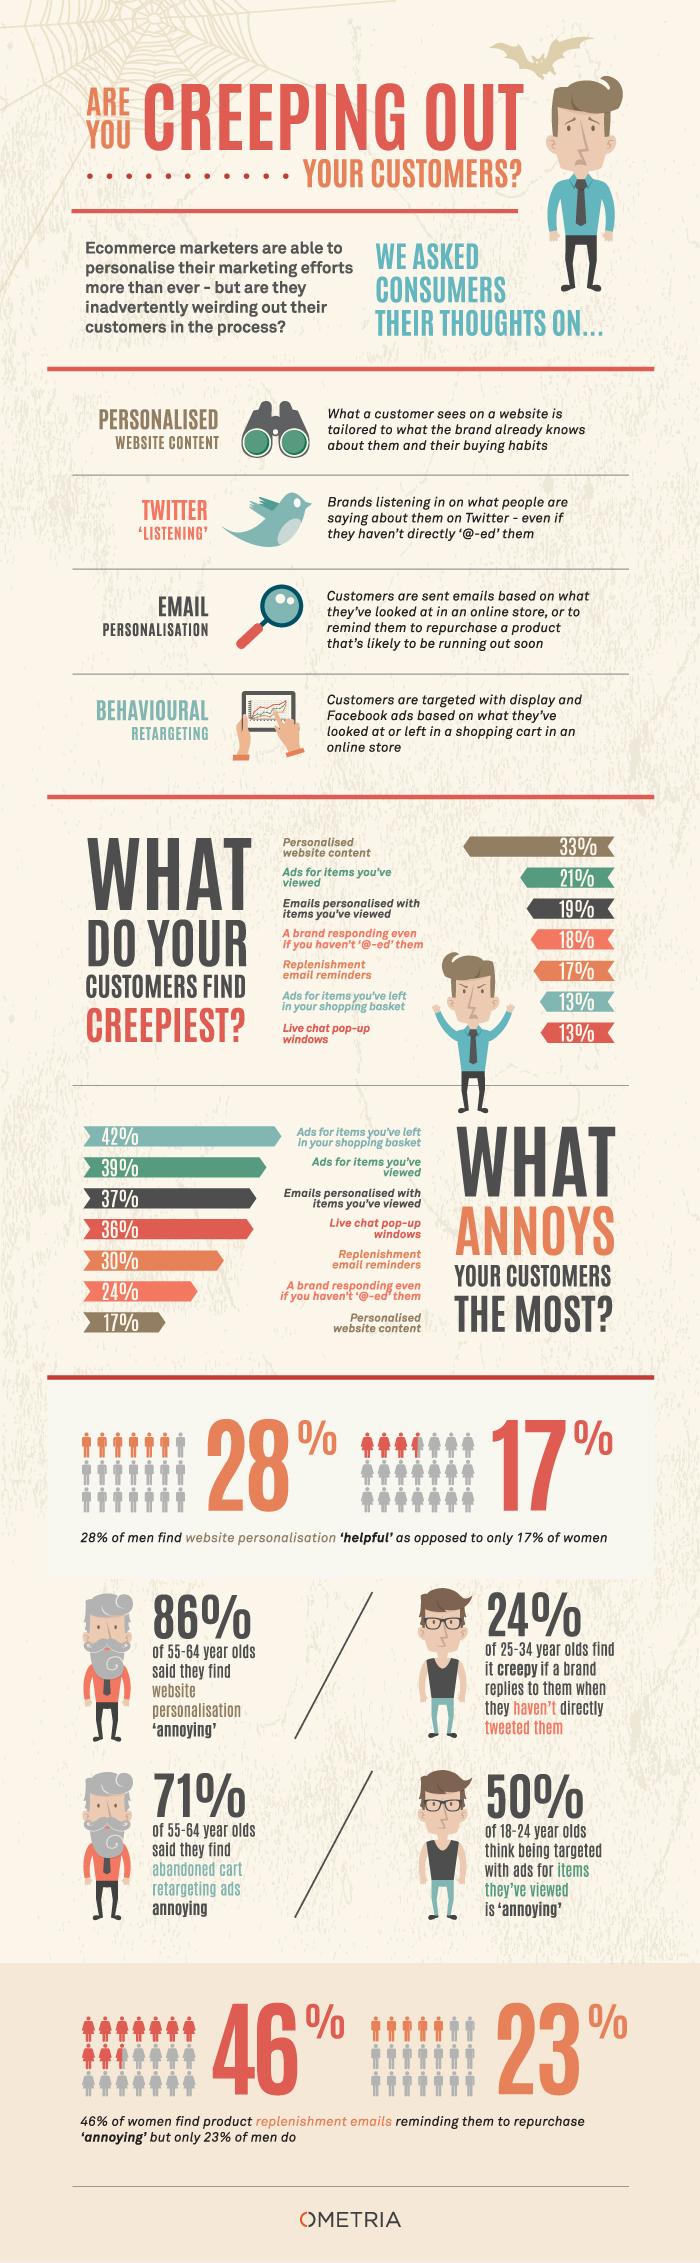 Digitales Marketing: Kunden fühlen sich beobachtet [Infografik]